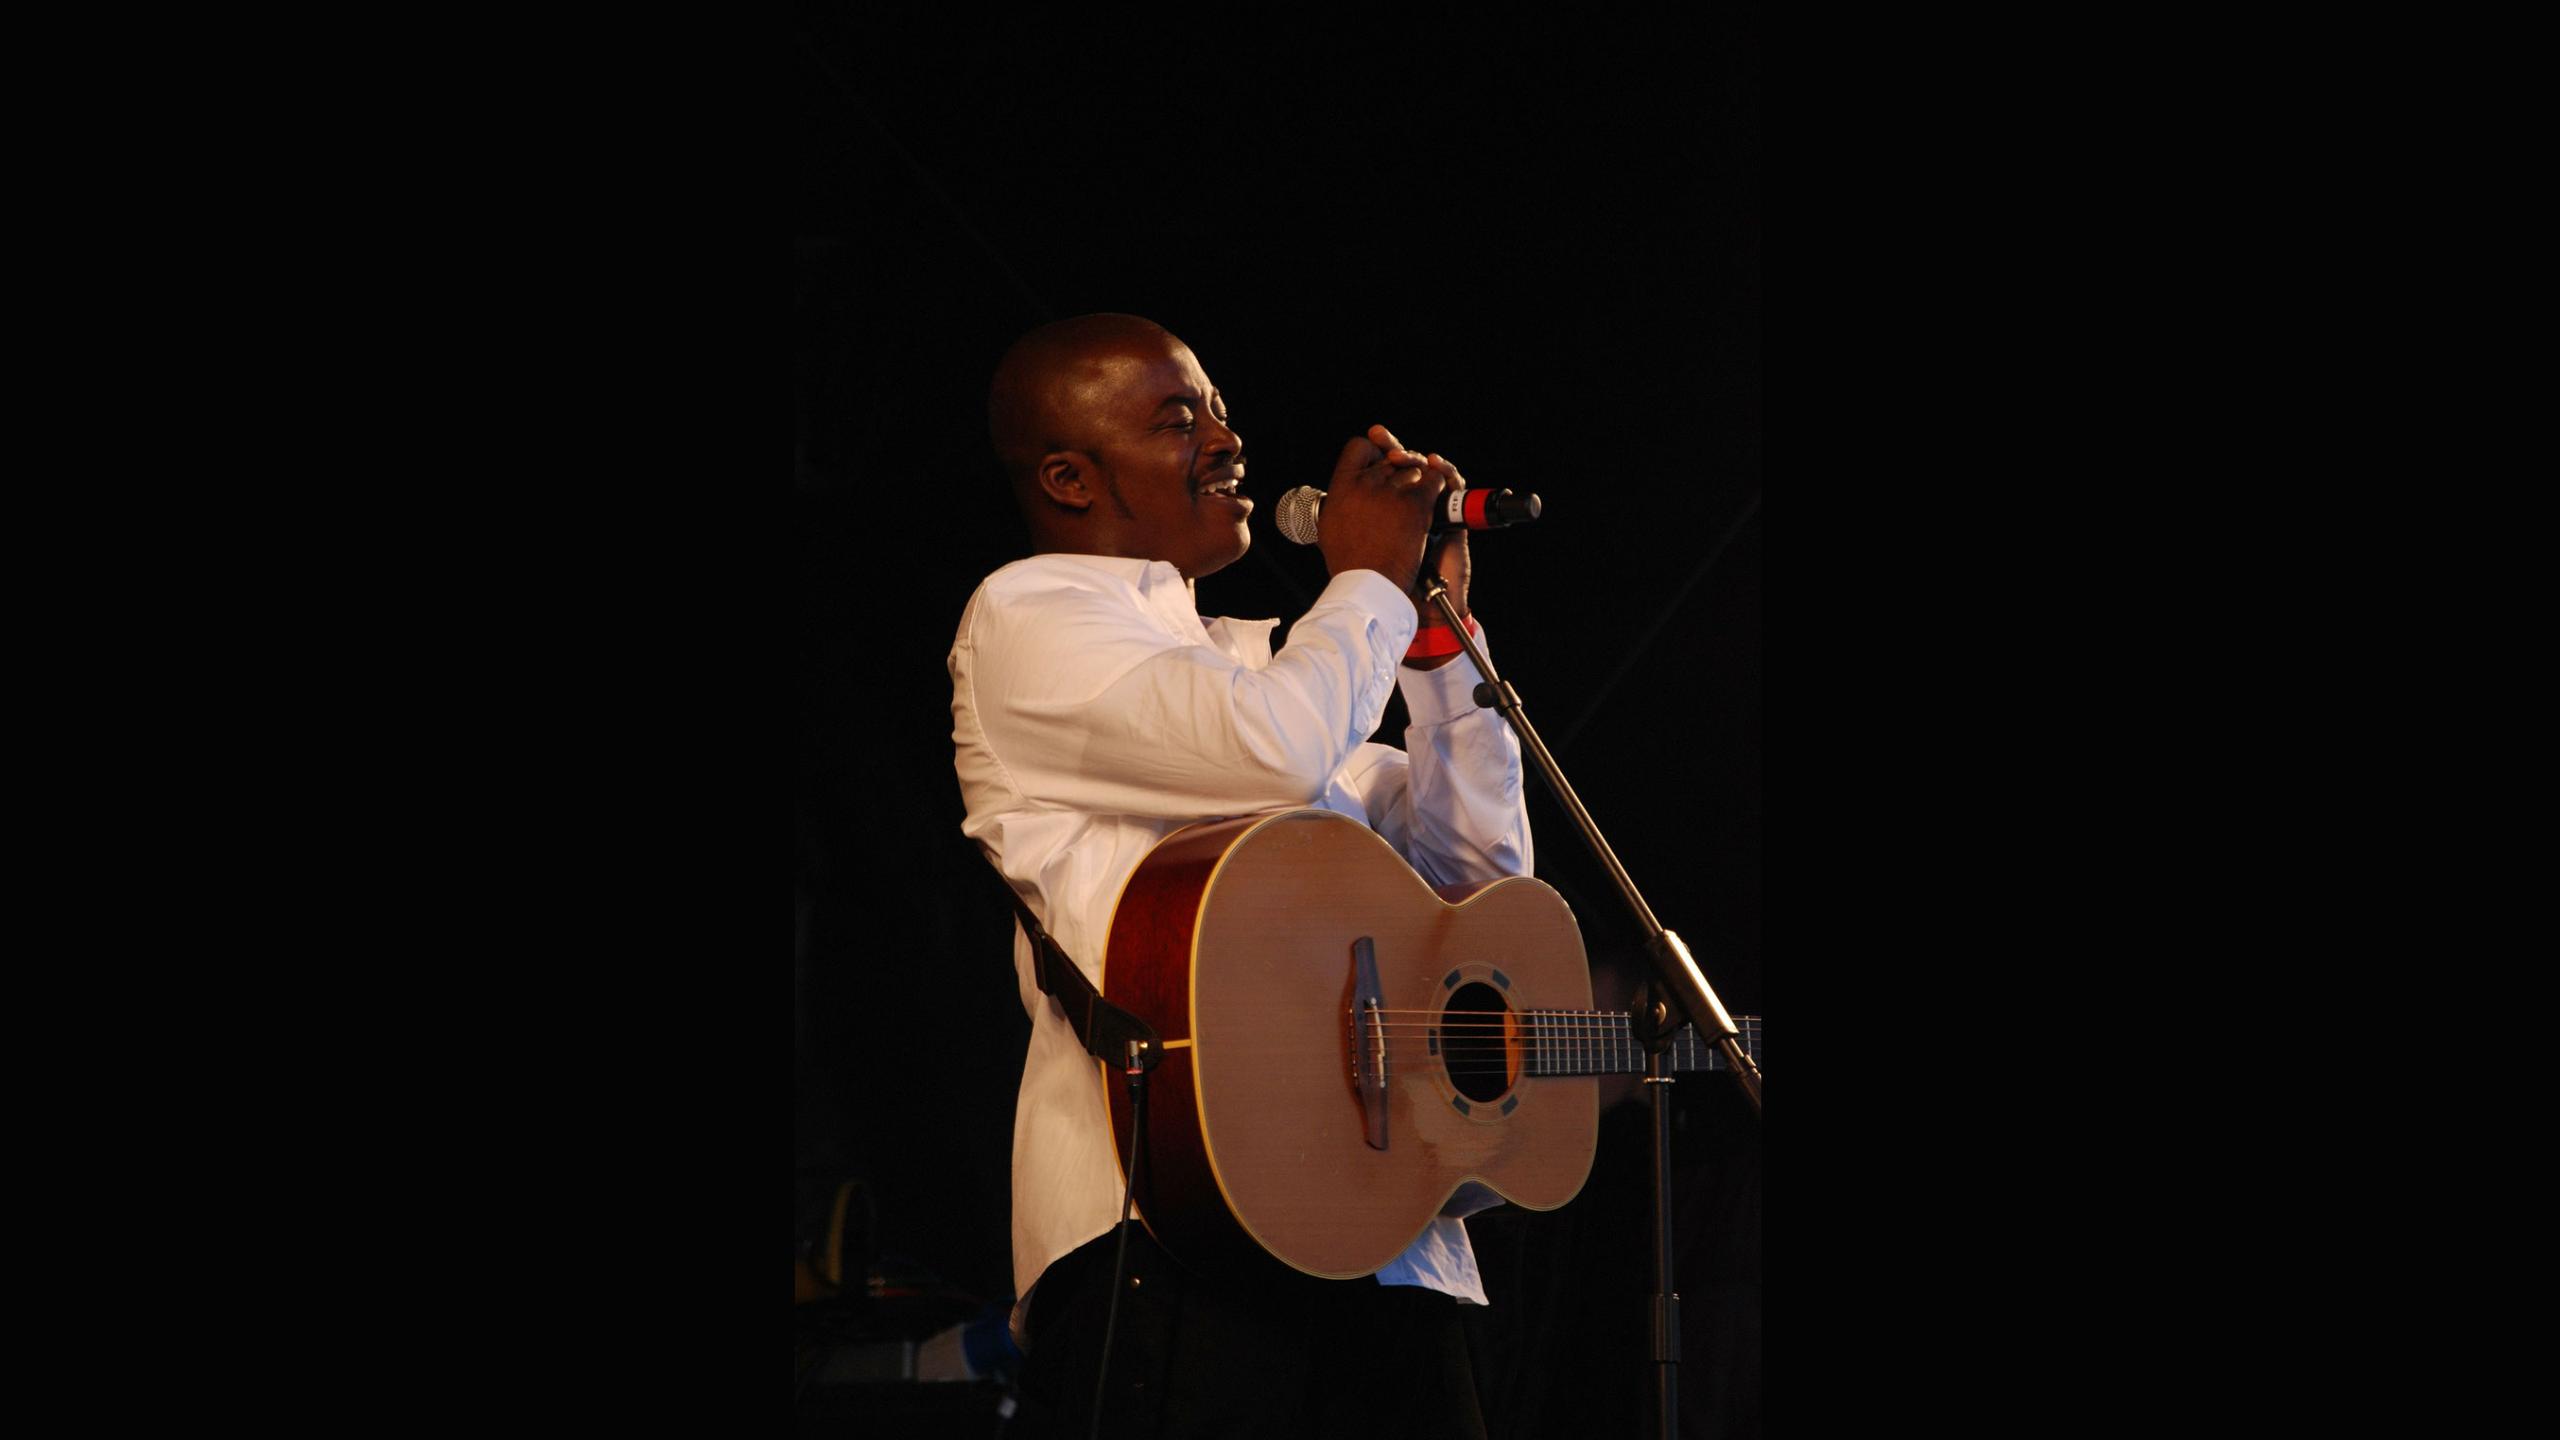 Man singing into microphone advertising Open Mic